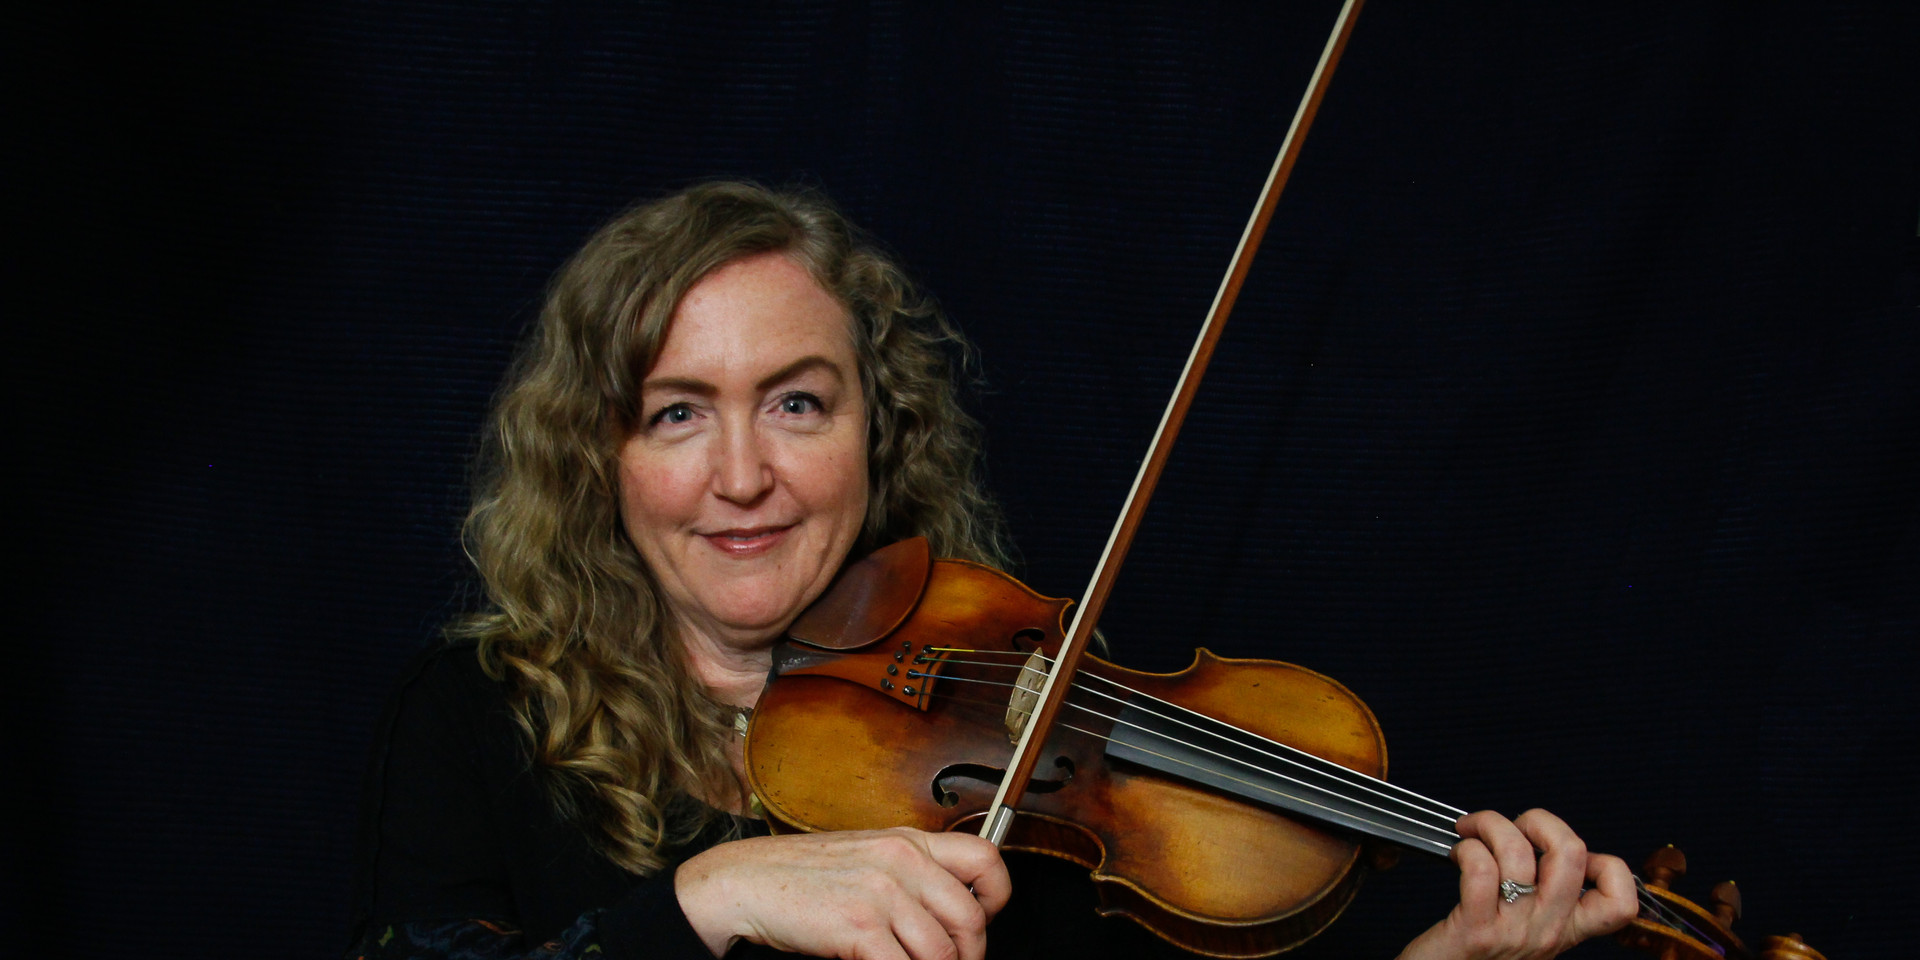 Cathie Van Wert Menard